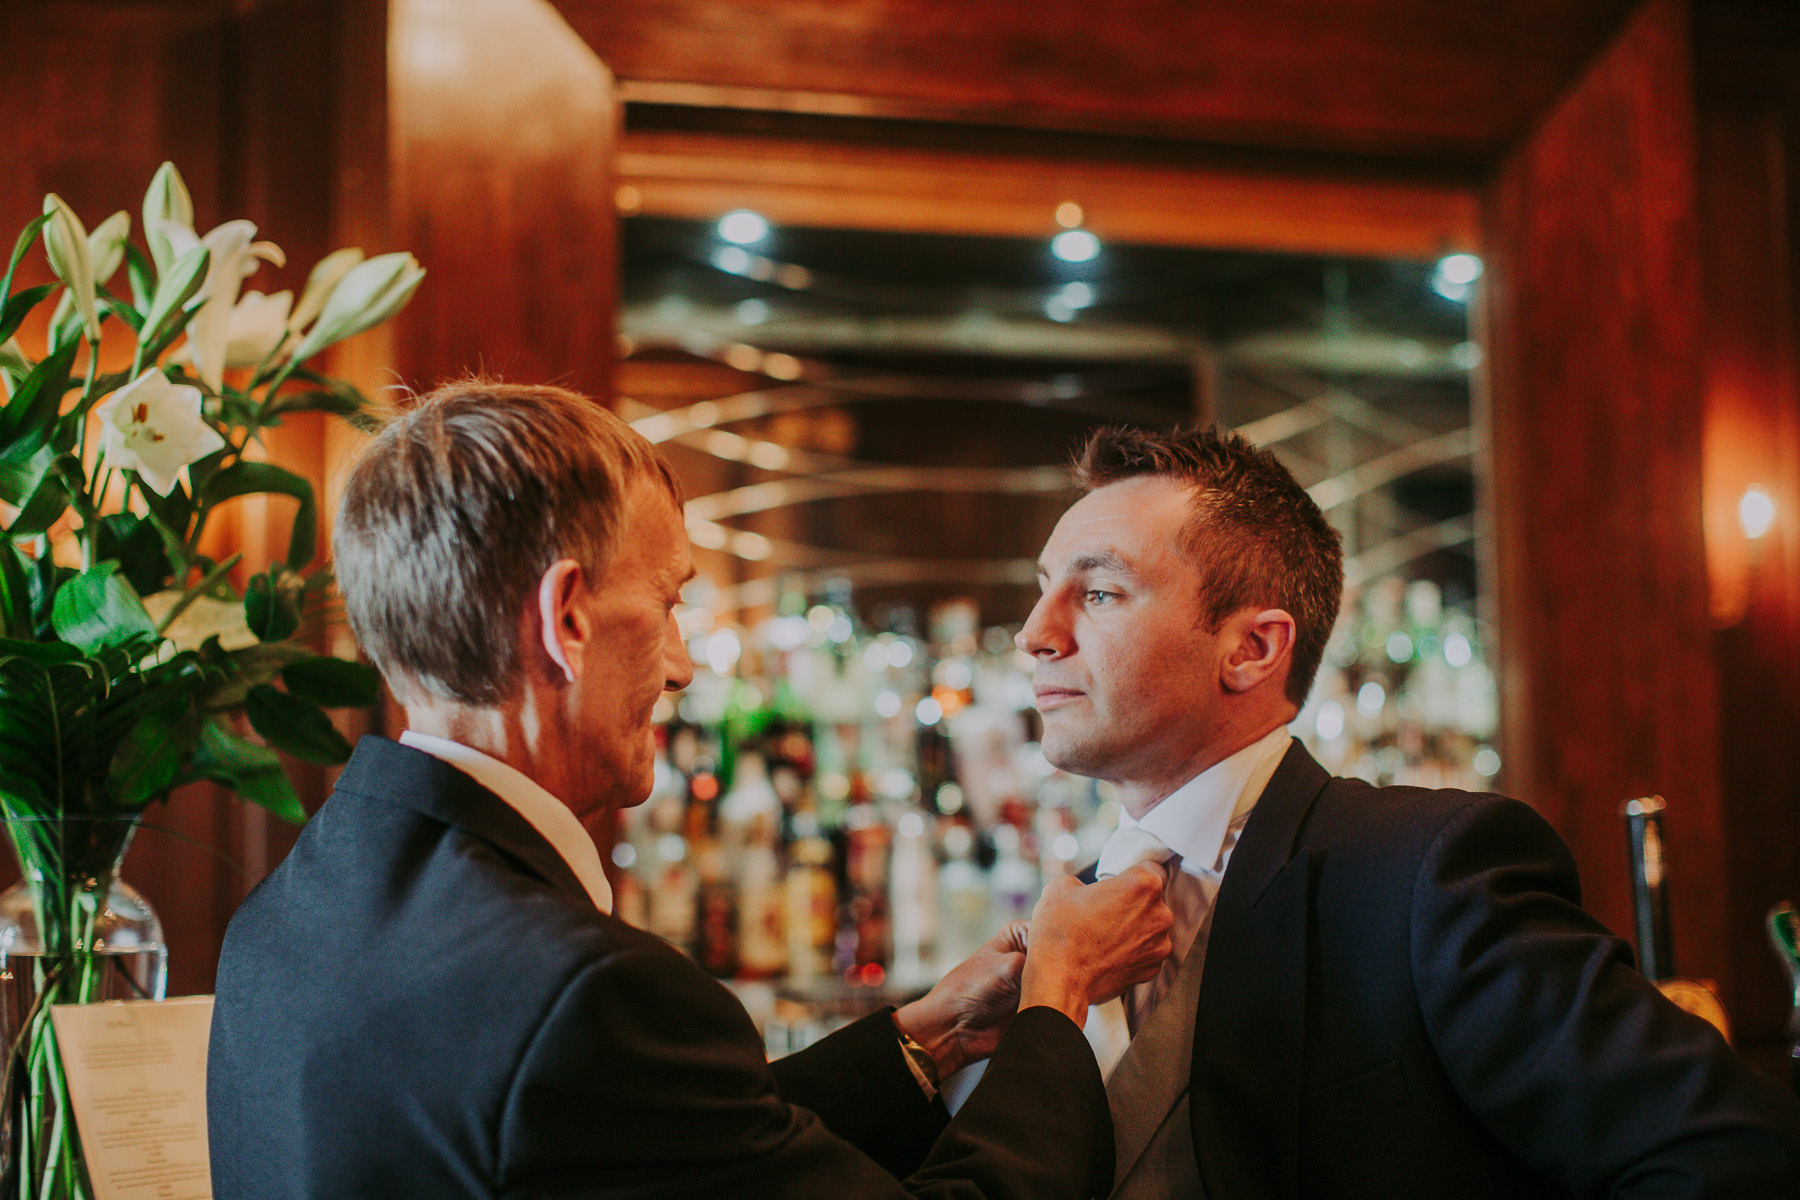 Meg & Jon | Wood Hall Hotel Wedding 20